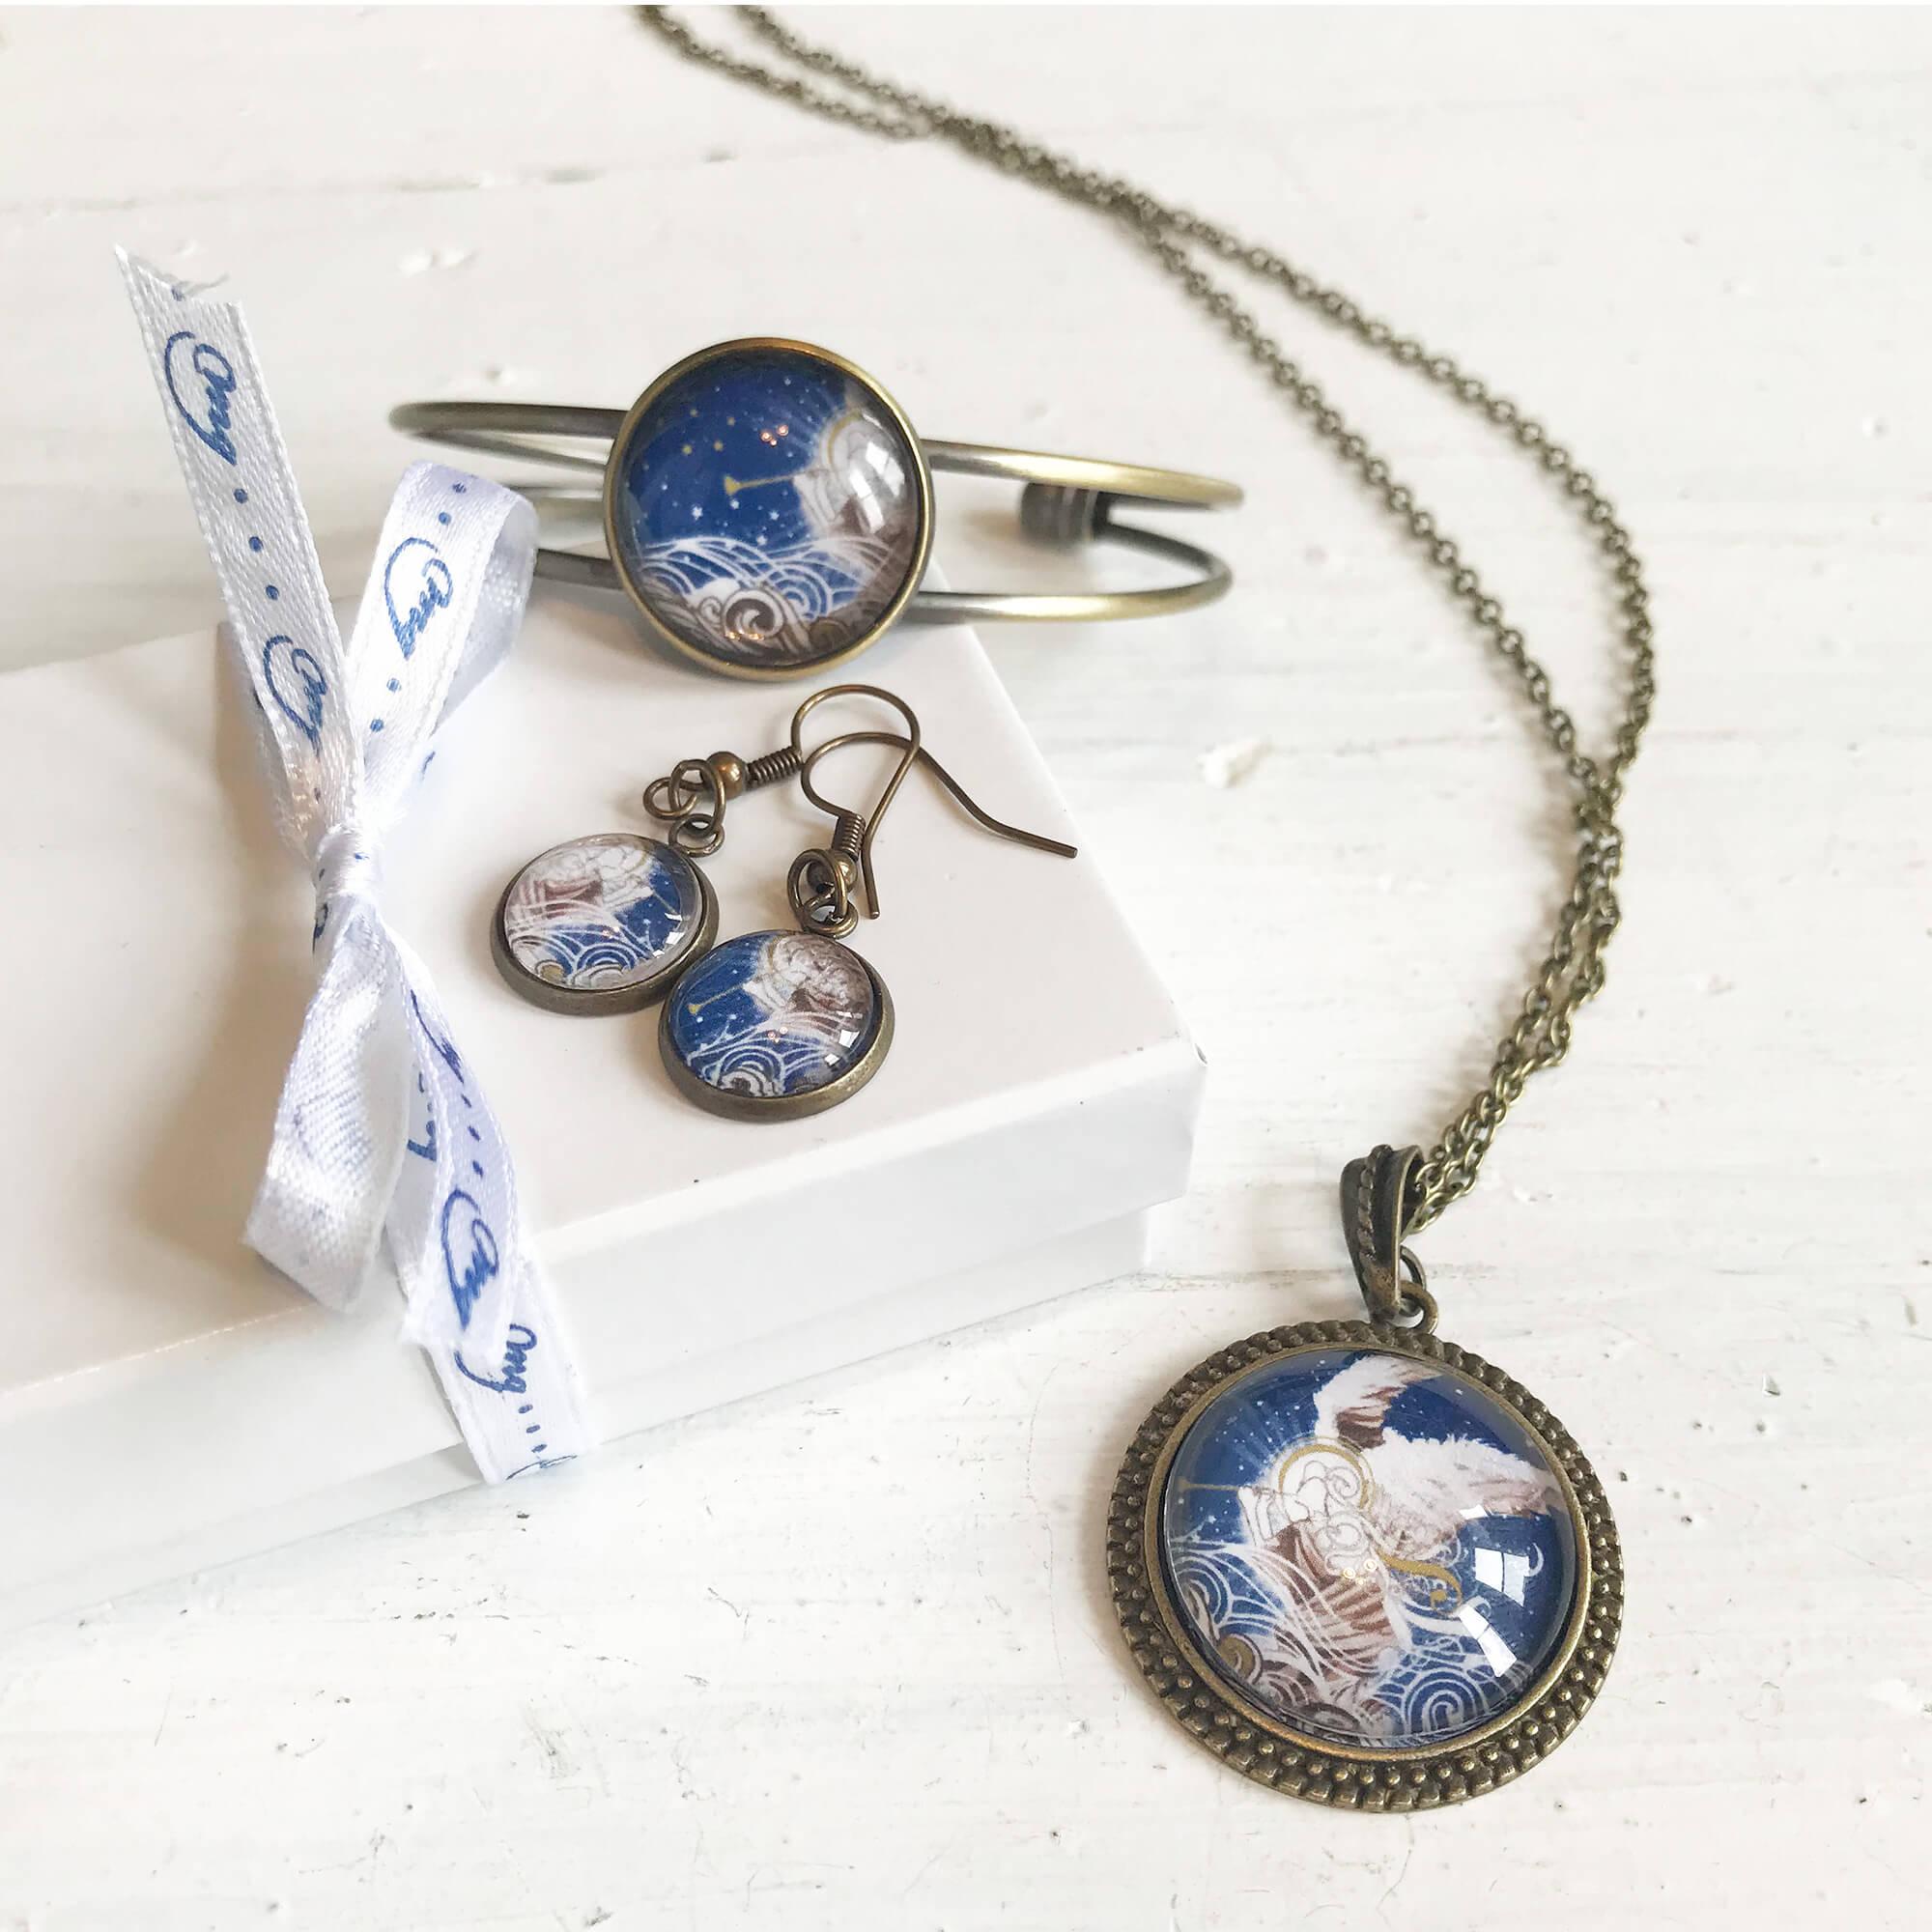 Angel assistance jewelry set - $55